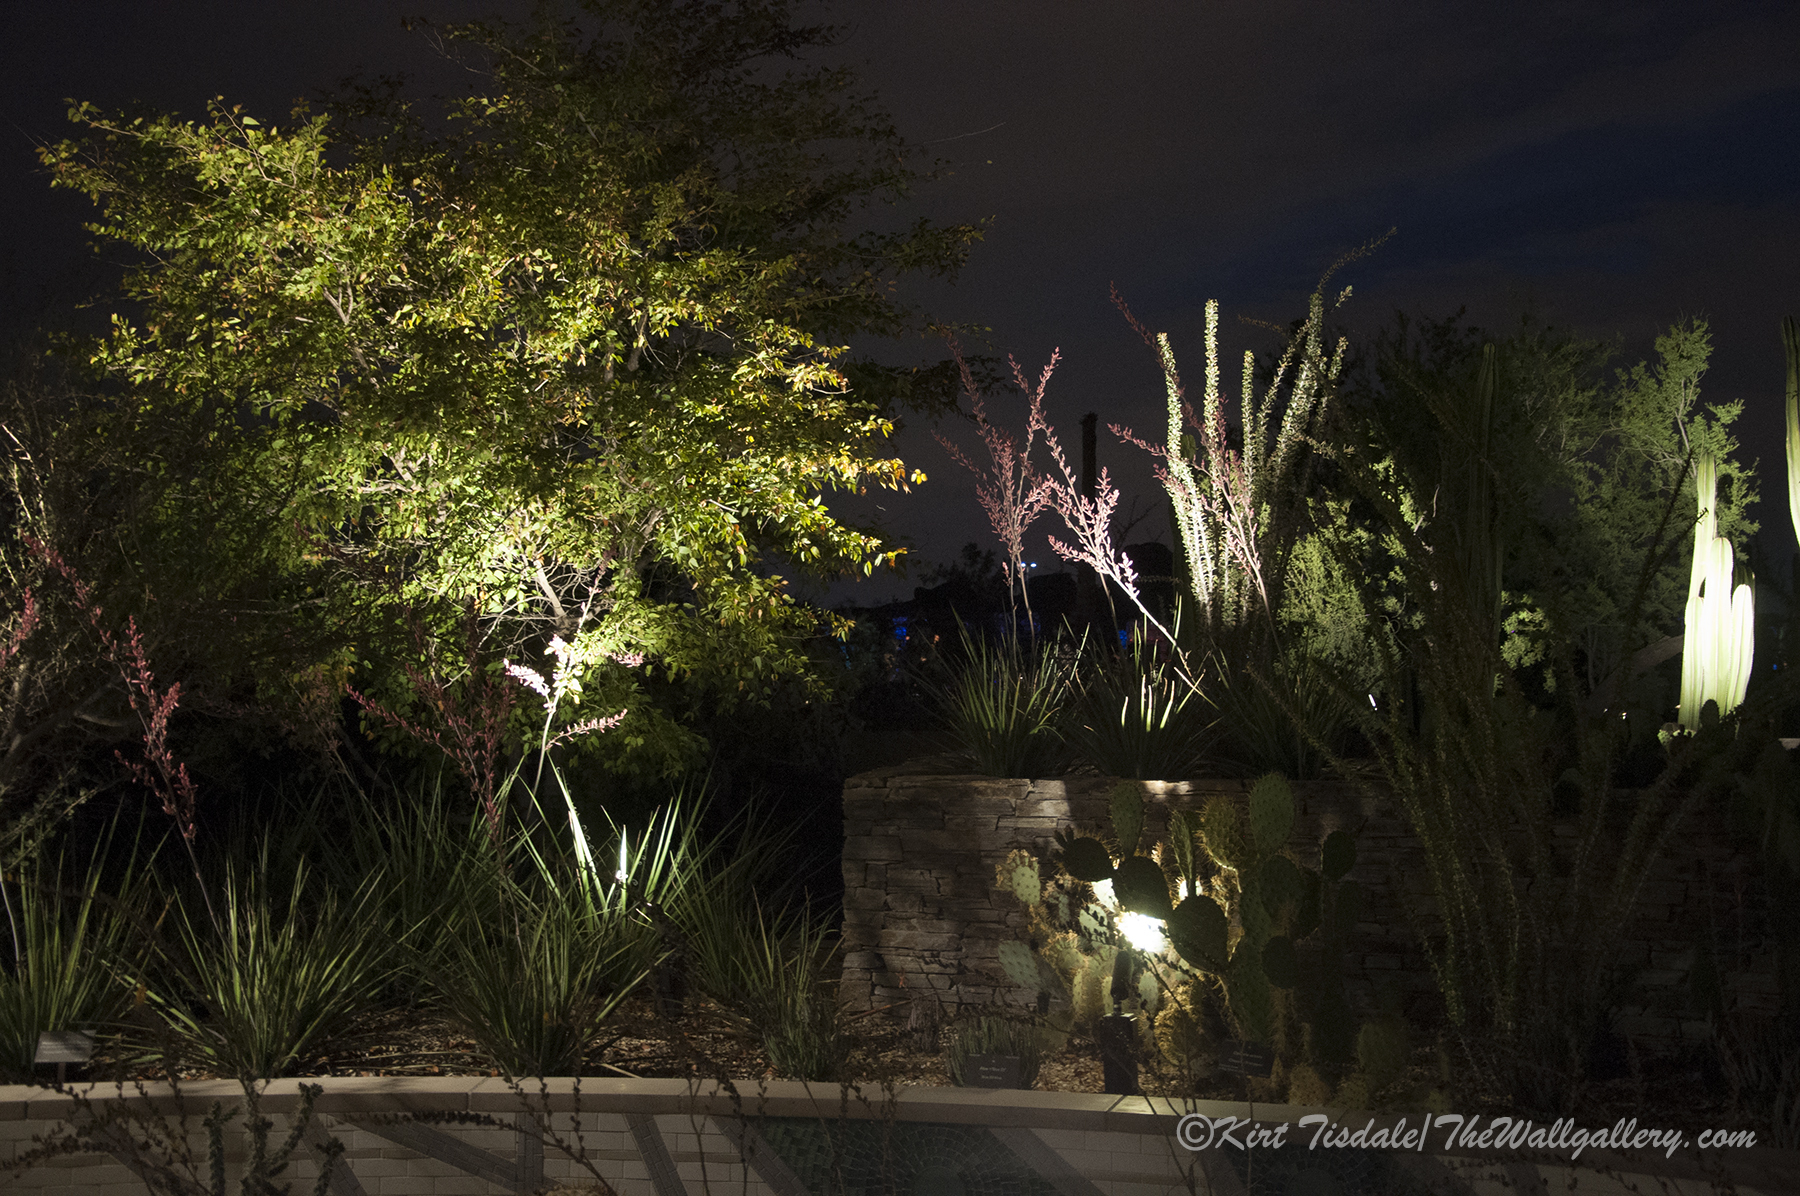 Desert botanical garden at night phoenix thewallgalleryblog for A night at the garden